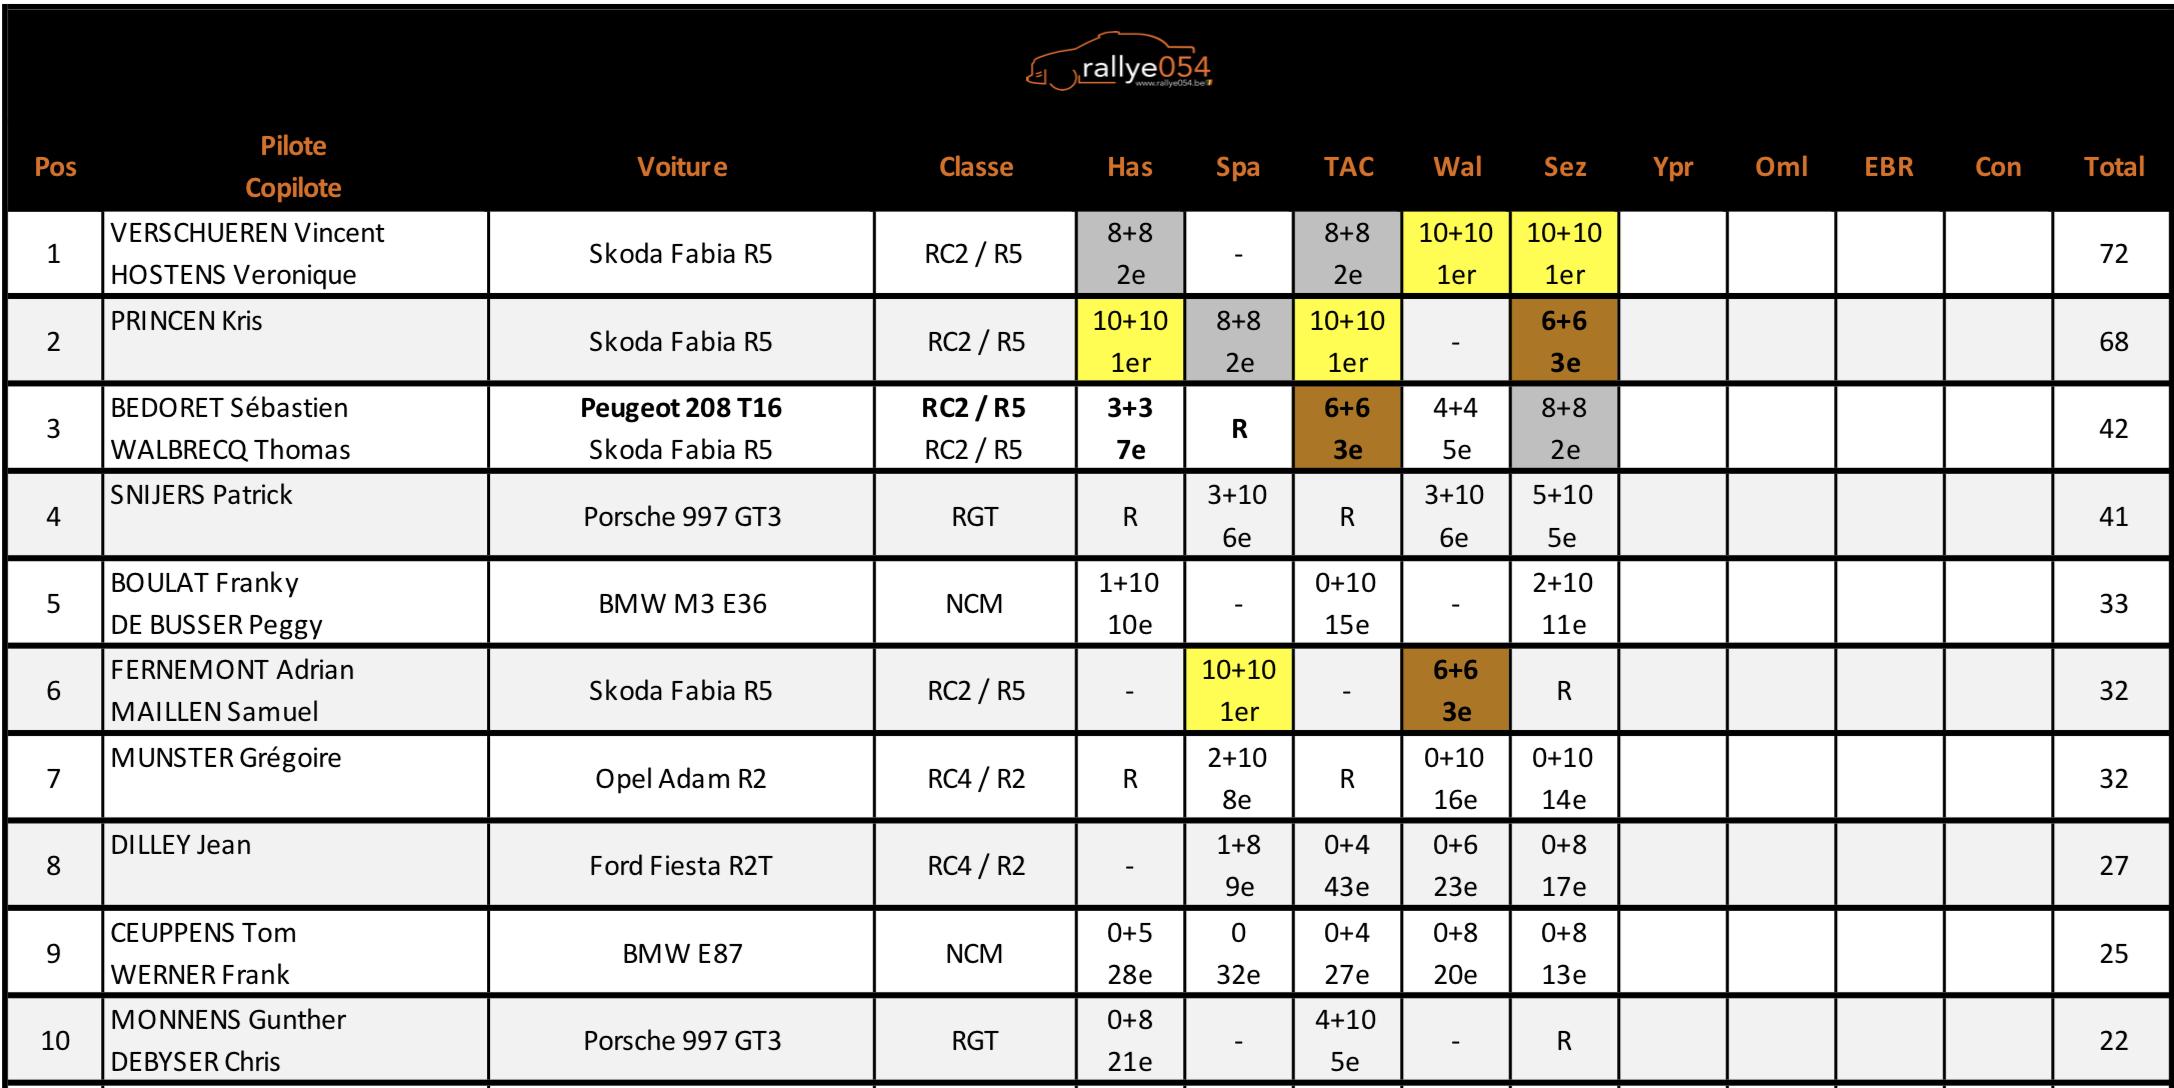 BRC-Classement-2018-rallye054.png